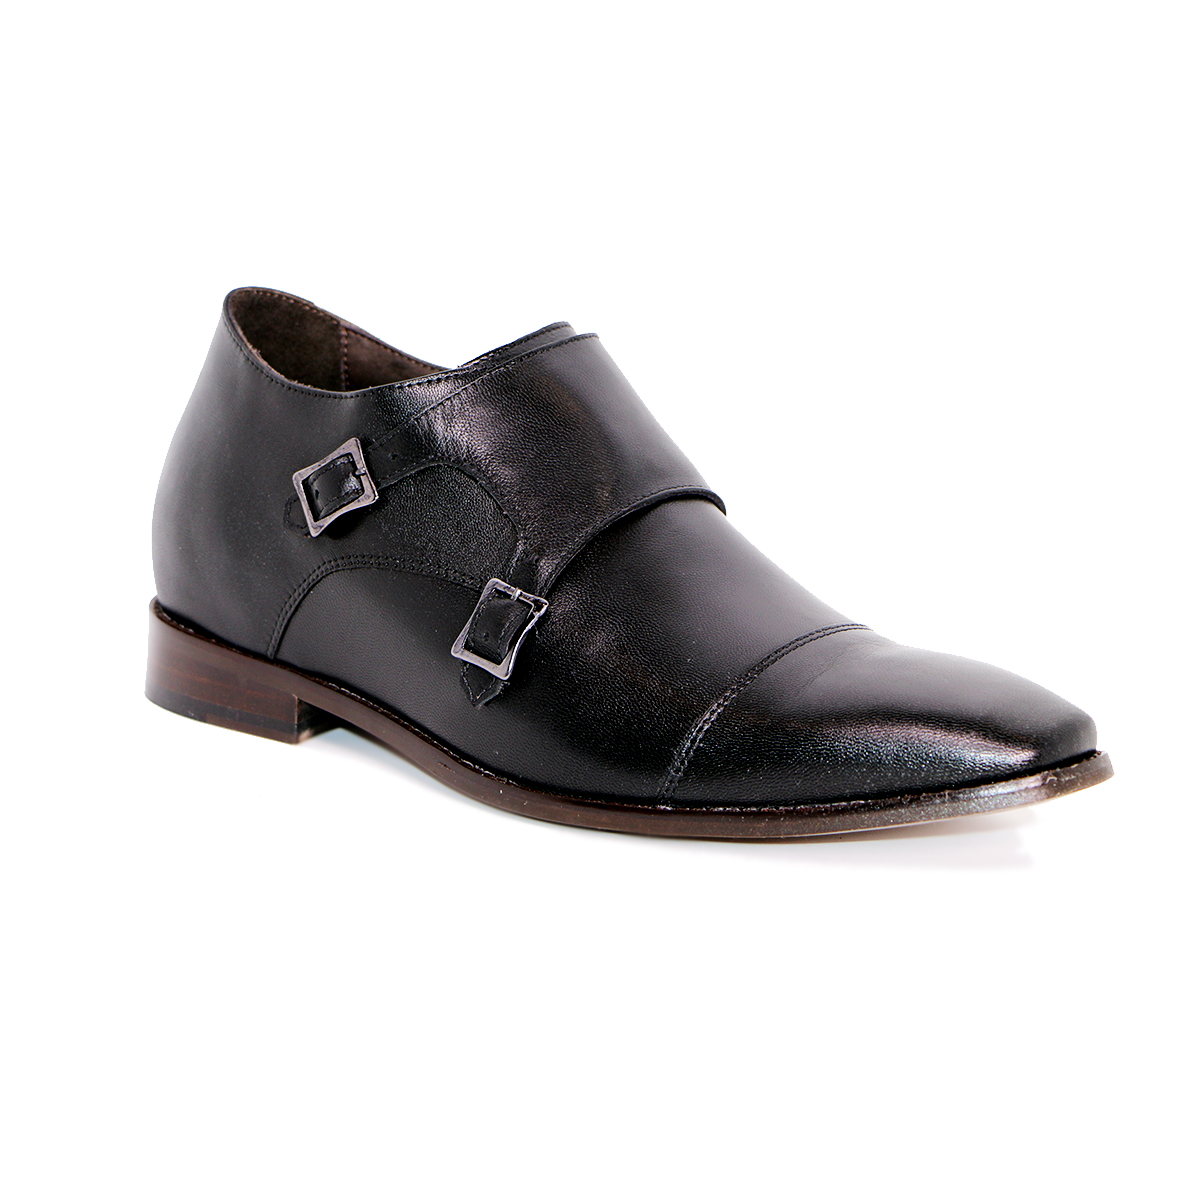 Zapato Formal Lawyers Negro Max Denegri +7cms De Altura_72933